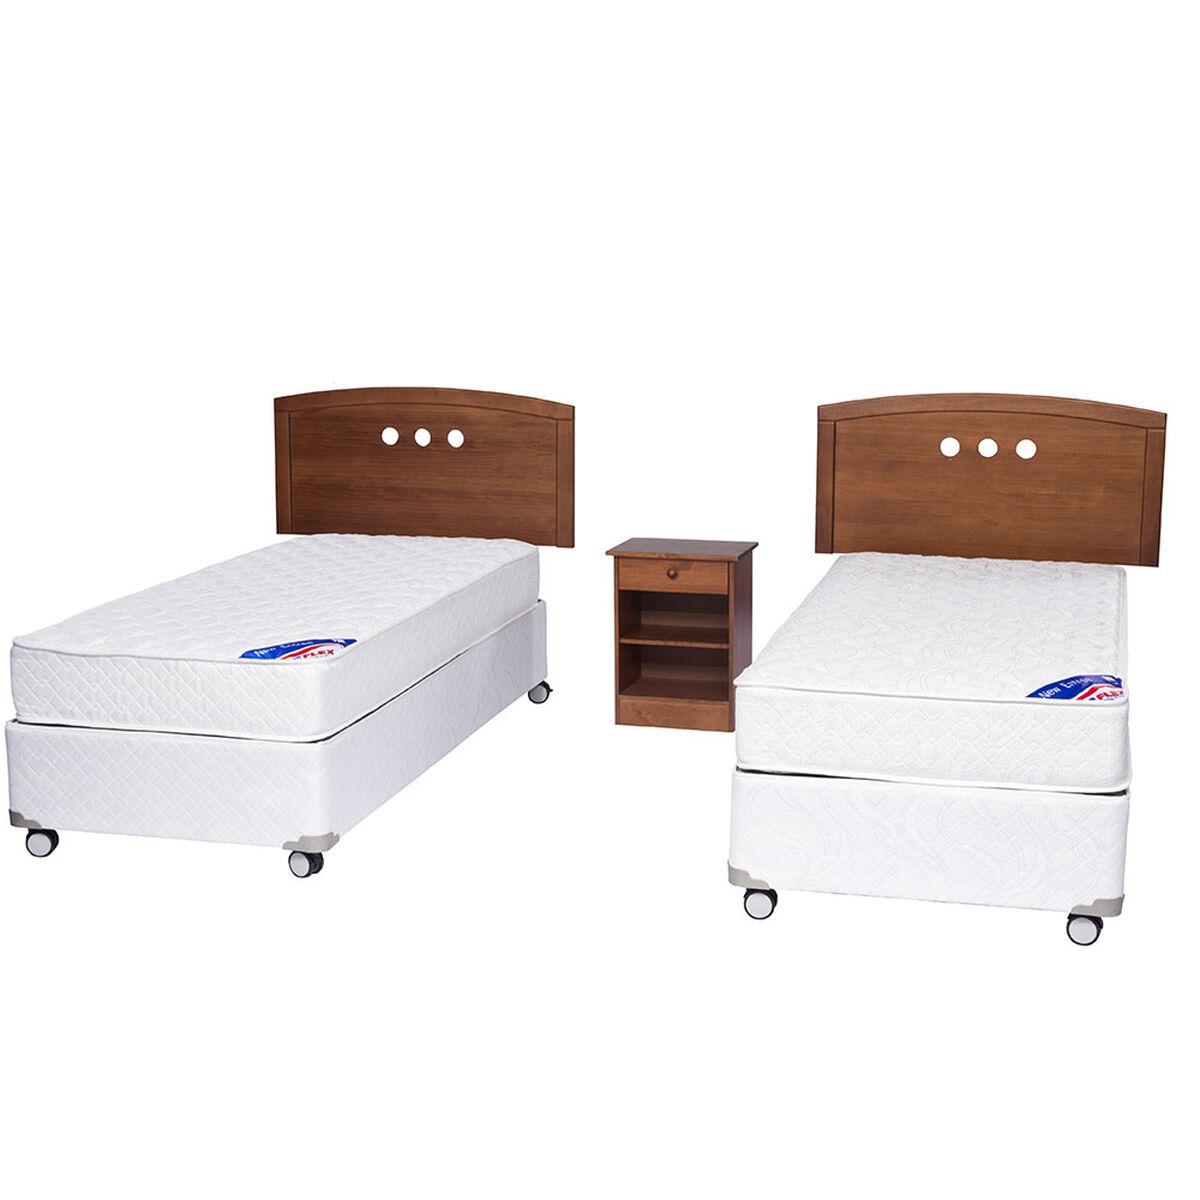 Doble Box Americano New Entree 1 Pl Flex + Muebles Juvenil